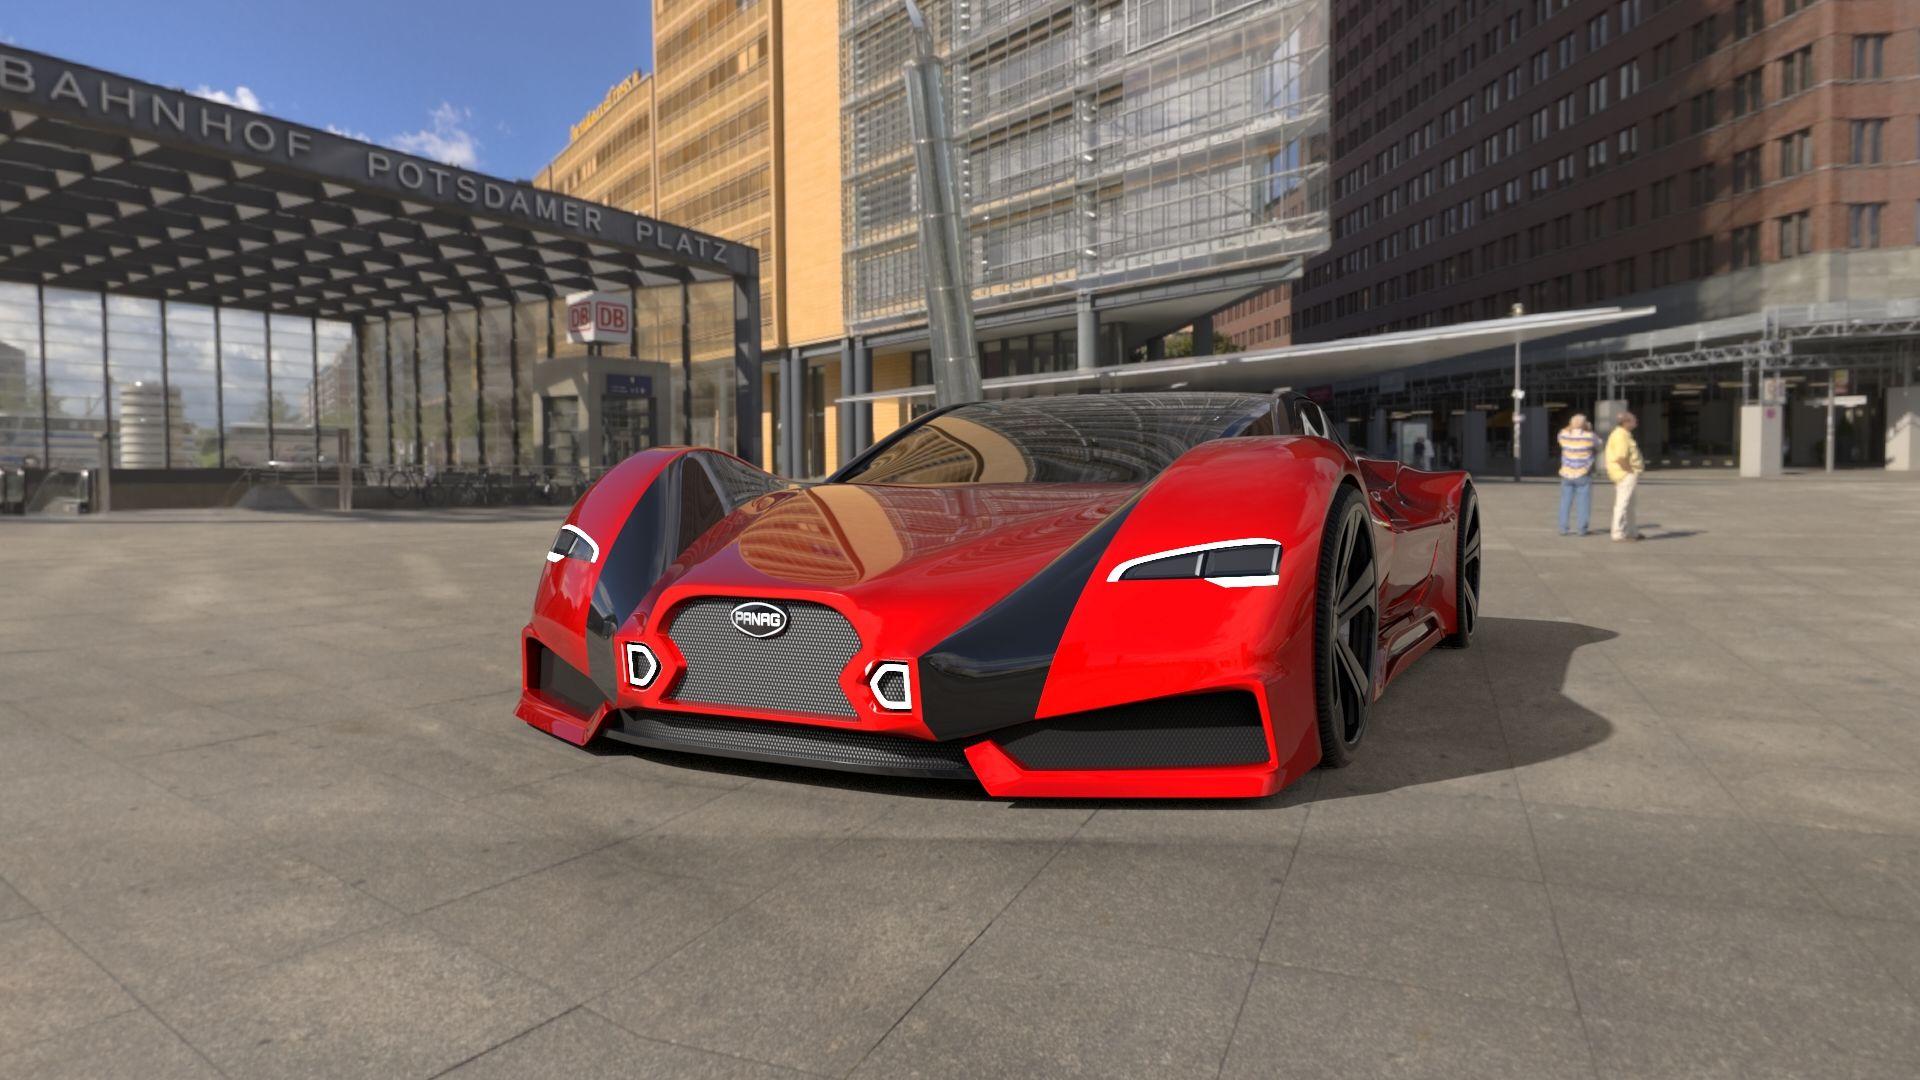 Hypercar-3500-3500